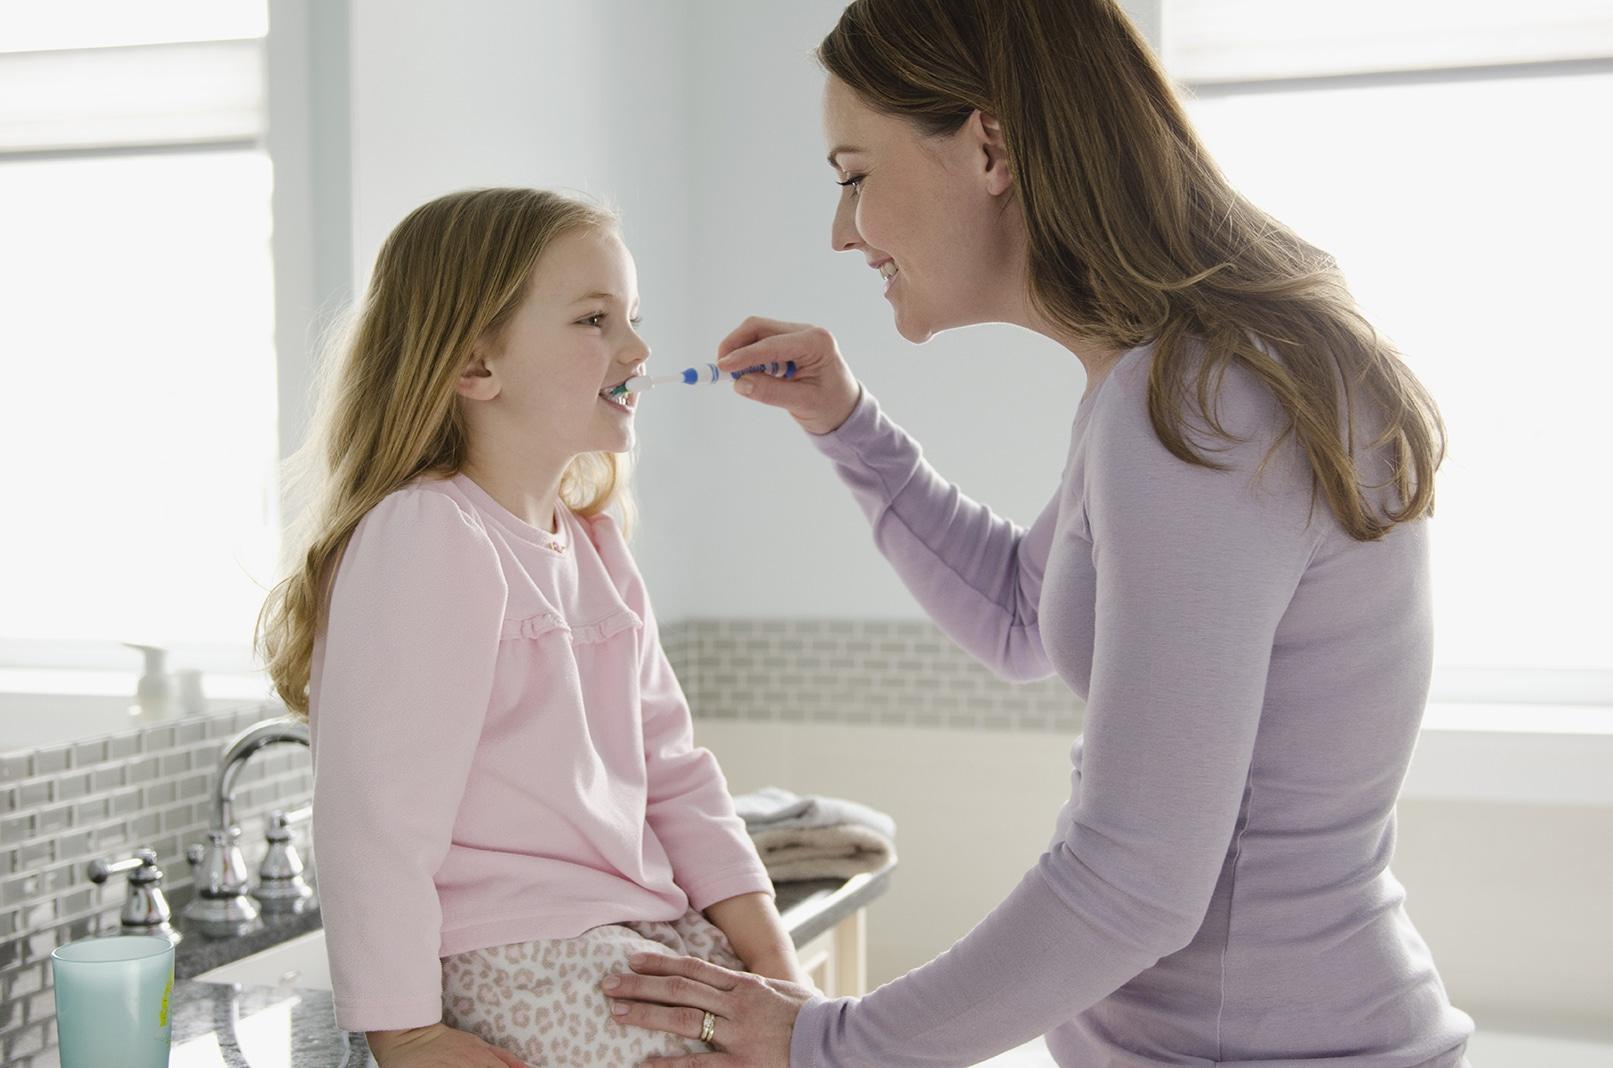 Mom brushing child's teeth